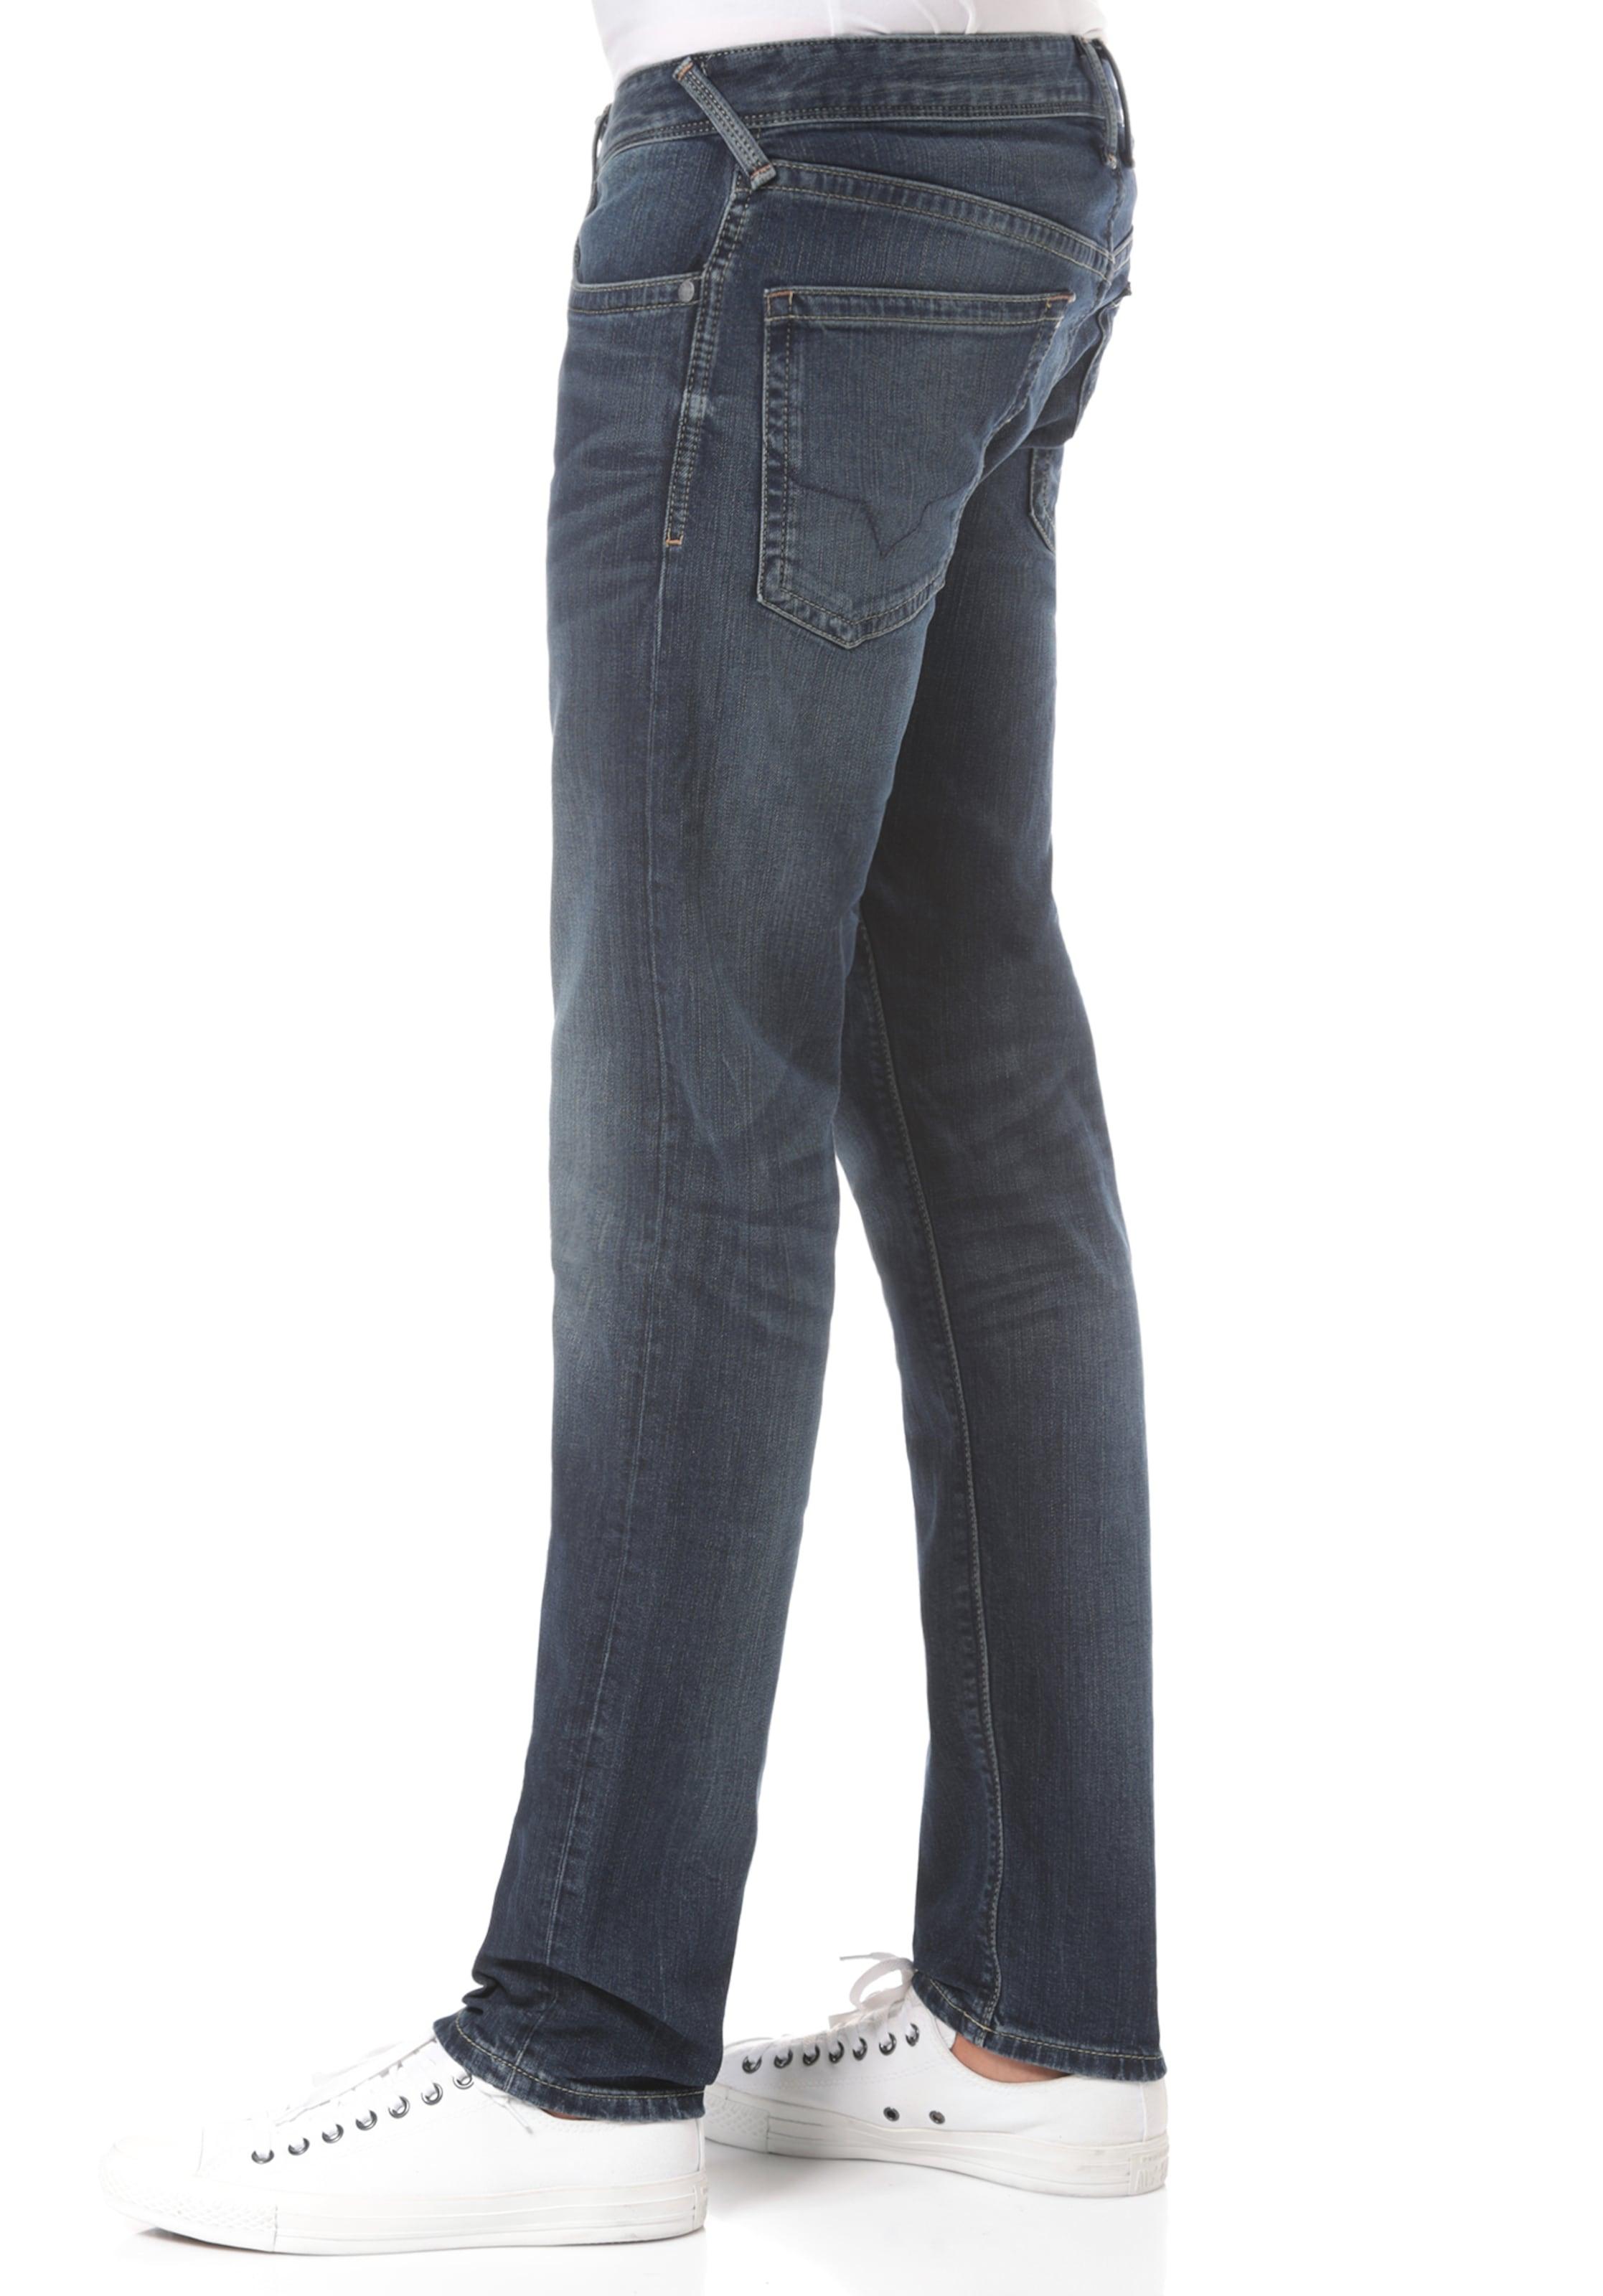 Jeans Jeans Pepe Dunkelblau In Dunkelblau Pepe 'hatch' 'hatch' In YyfvbI76g